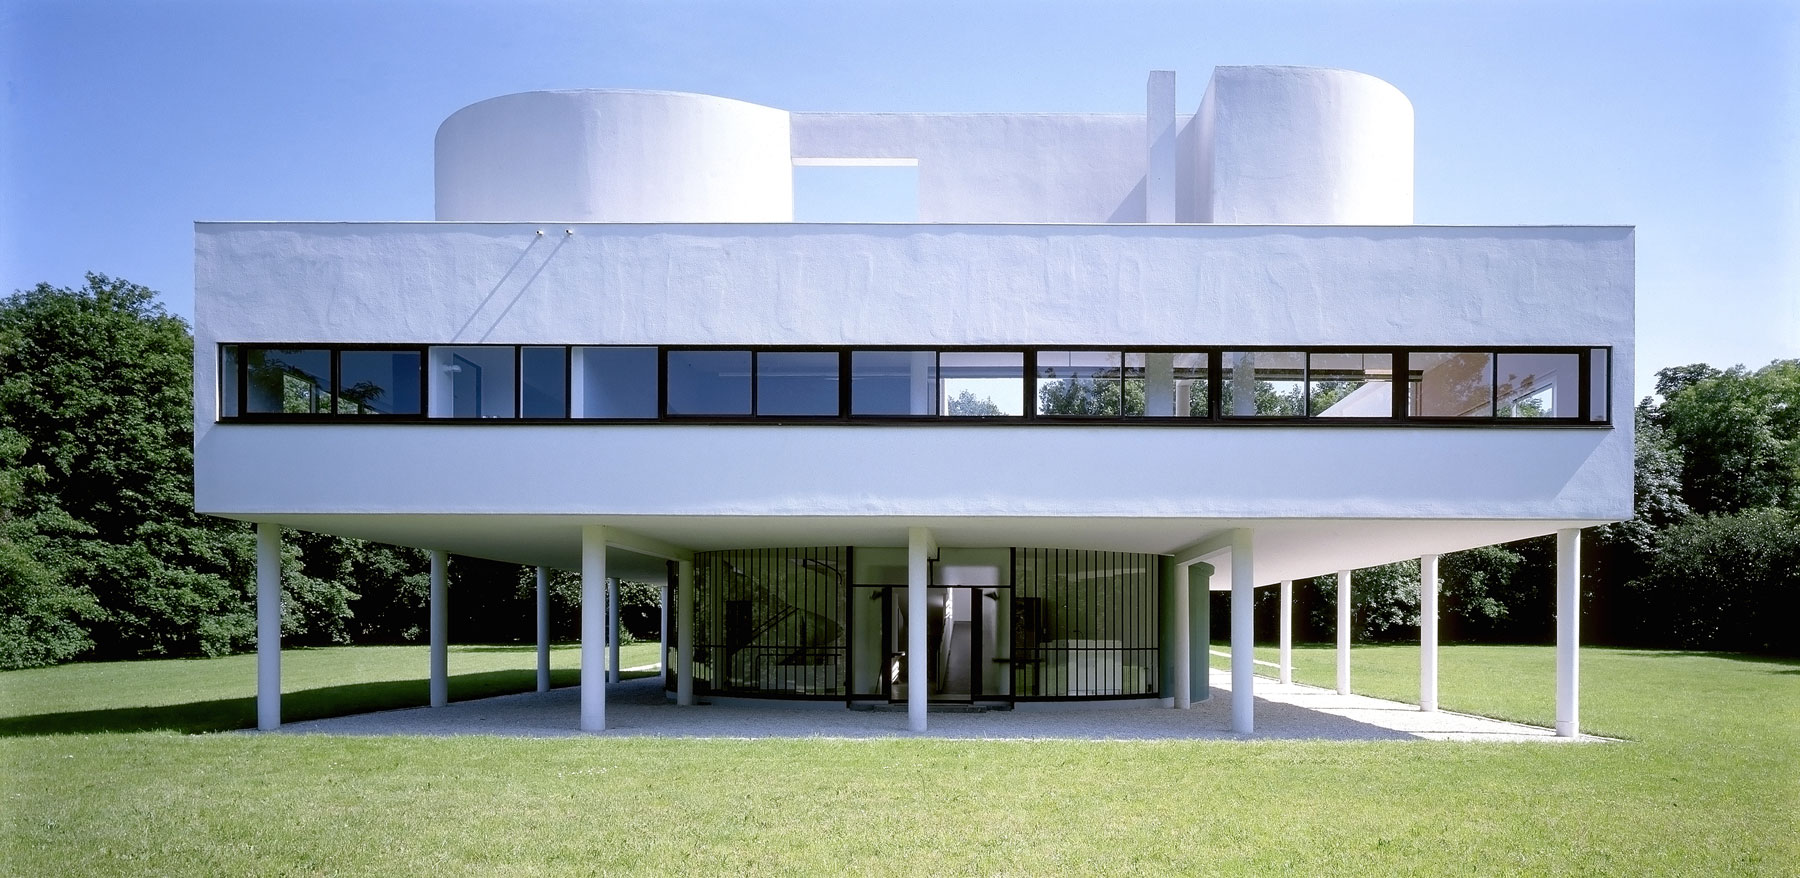 3 hida le corbusier la cit radieuse 1947 9152 1 for Architecture le corbusier